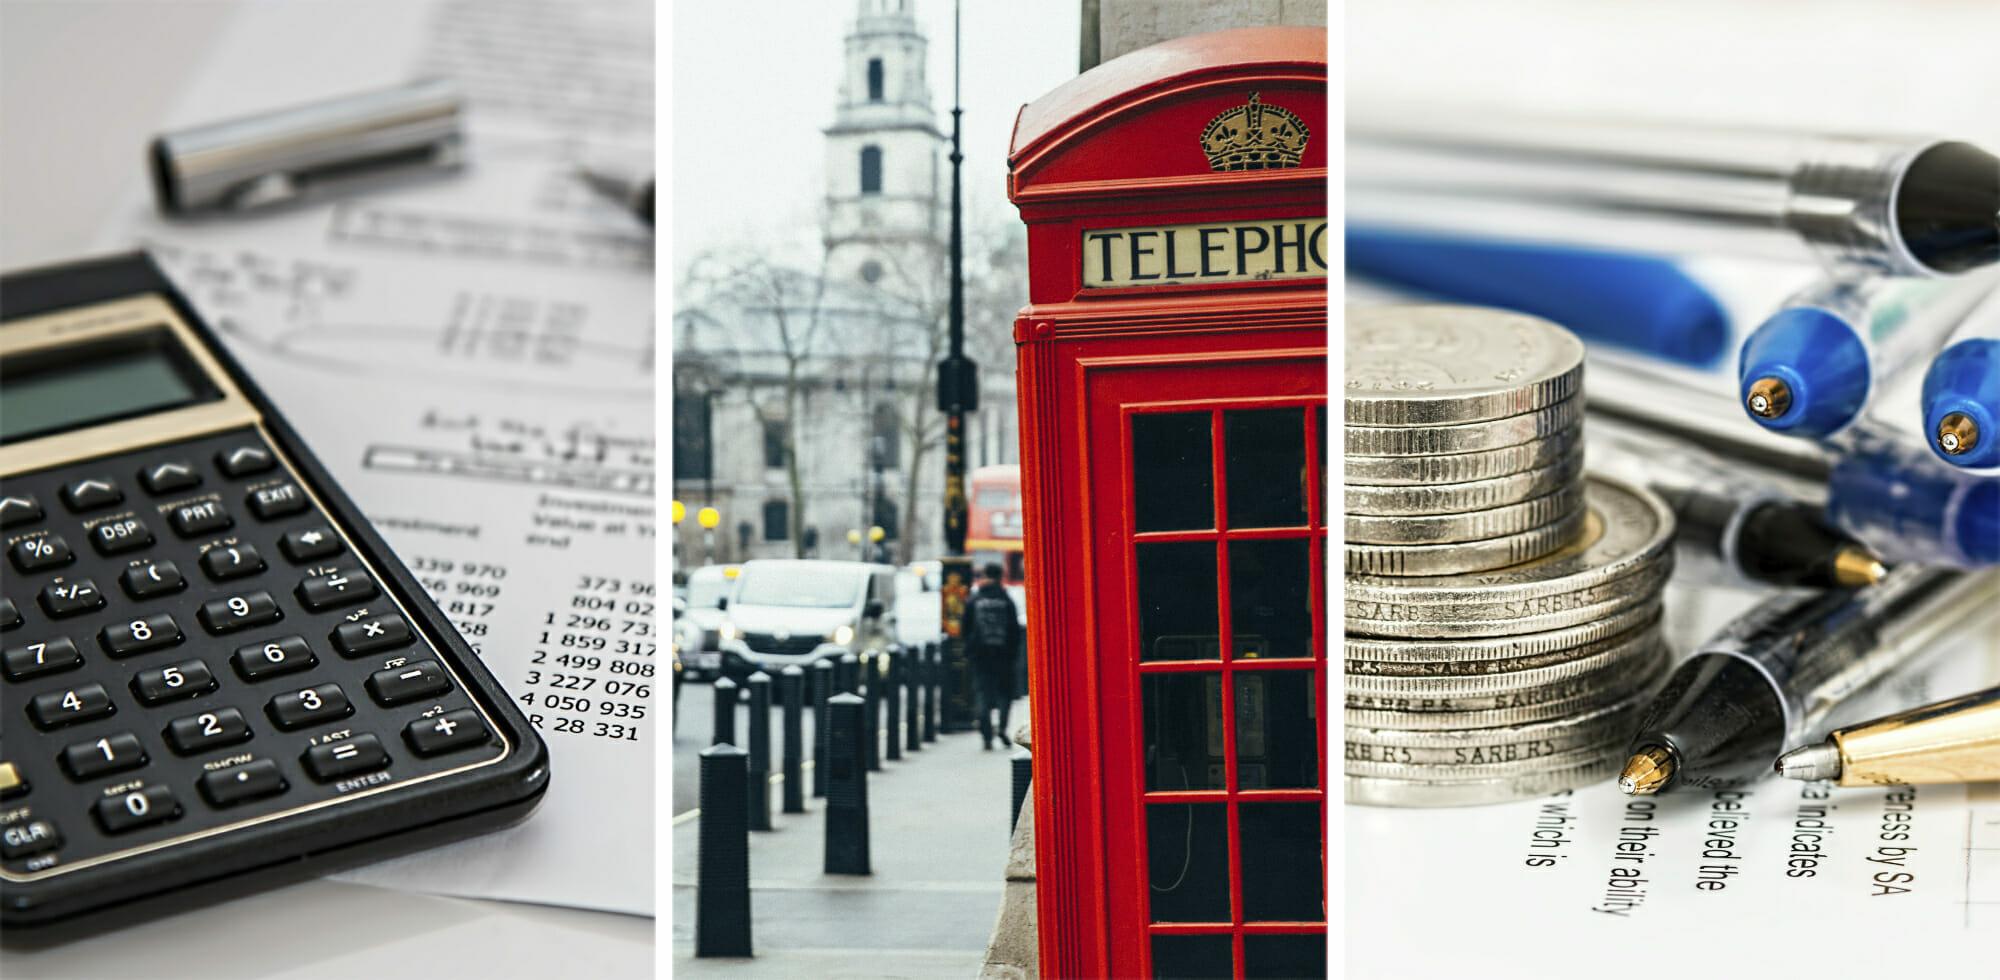 Study Abroad in London Budget Worksheet (Essential) via @girlsgonelondon